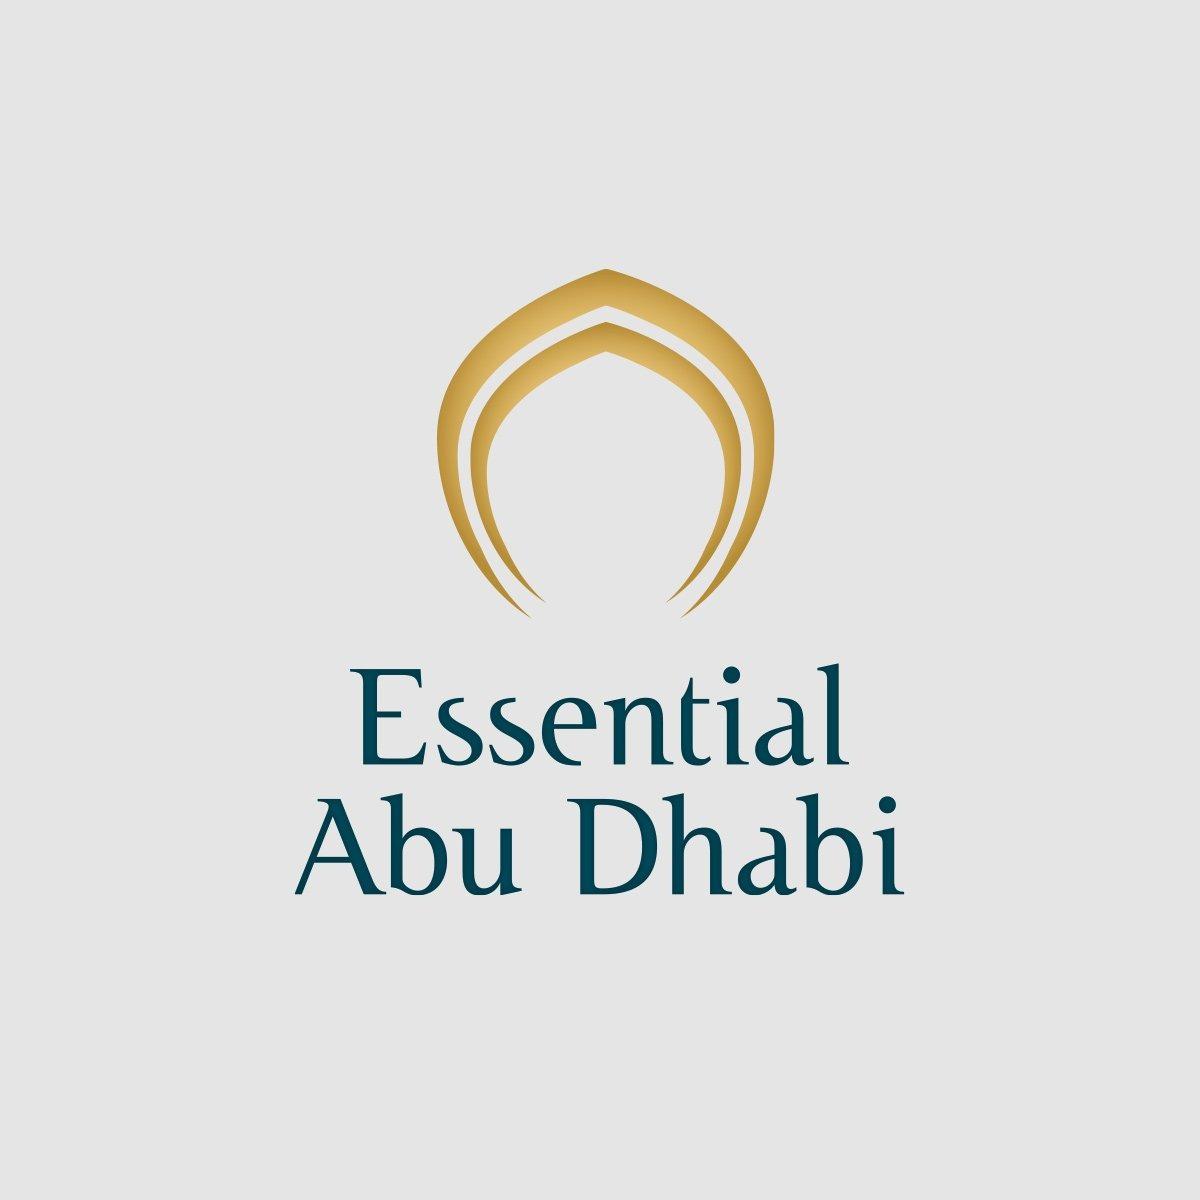 Essential AbuDhabi